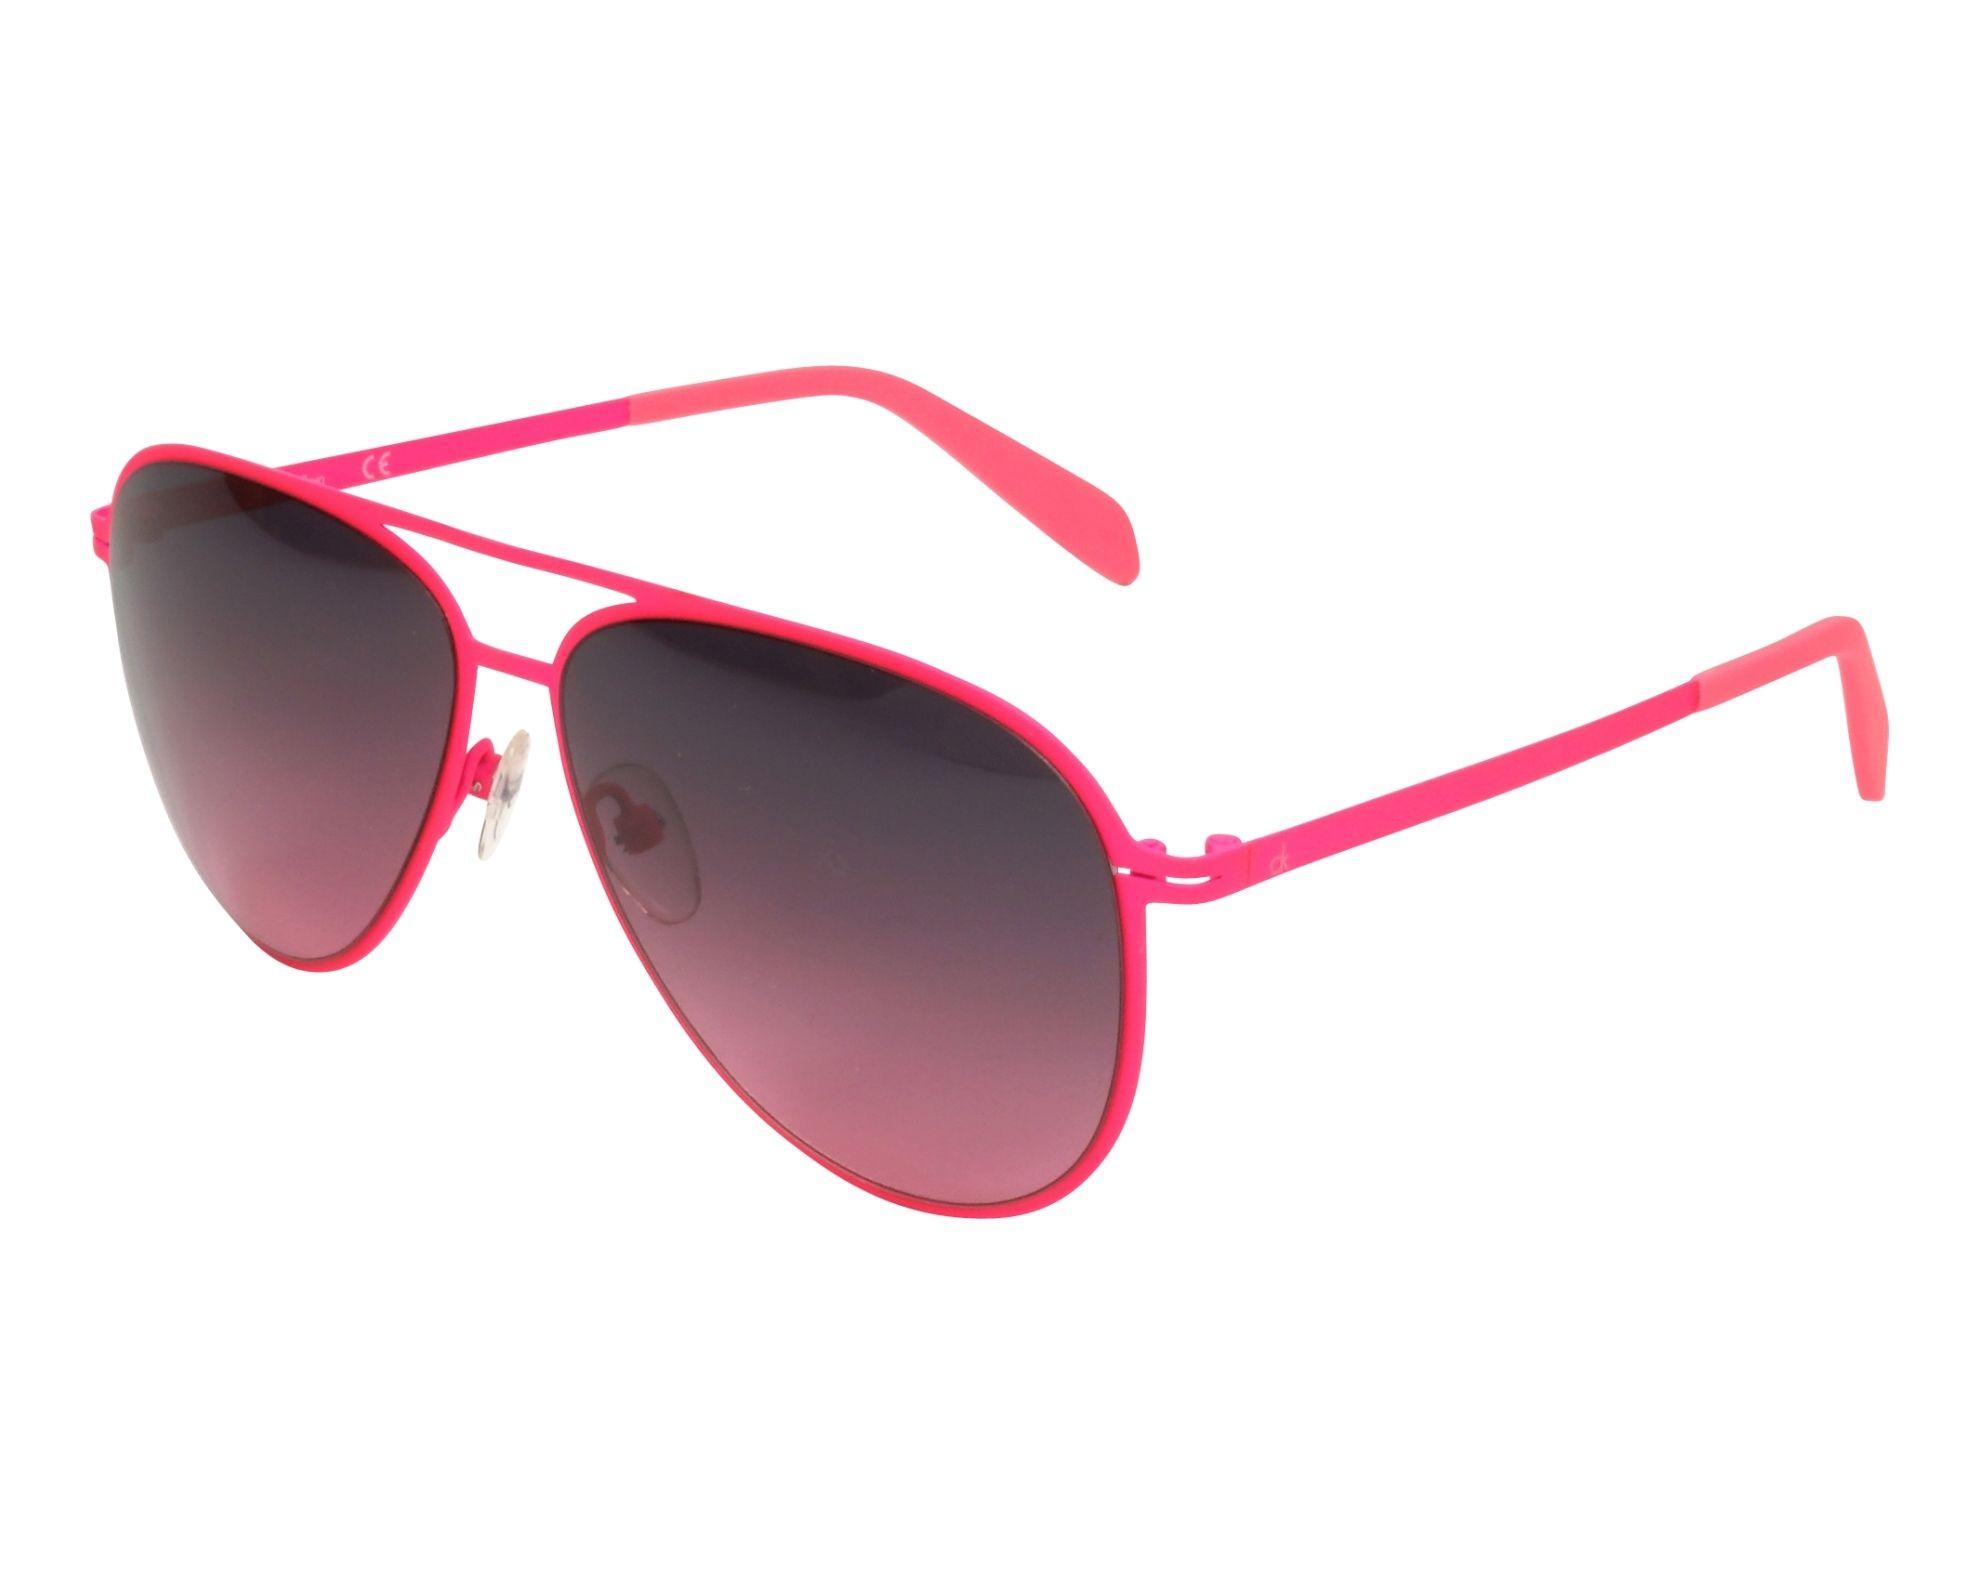 8b0fa14759 Gafas de sol Calvin Klein CK-2138-S 664 56-13 Rosa vista